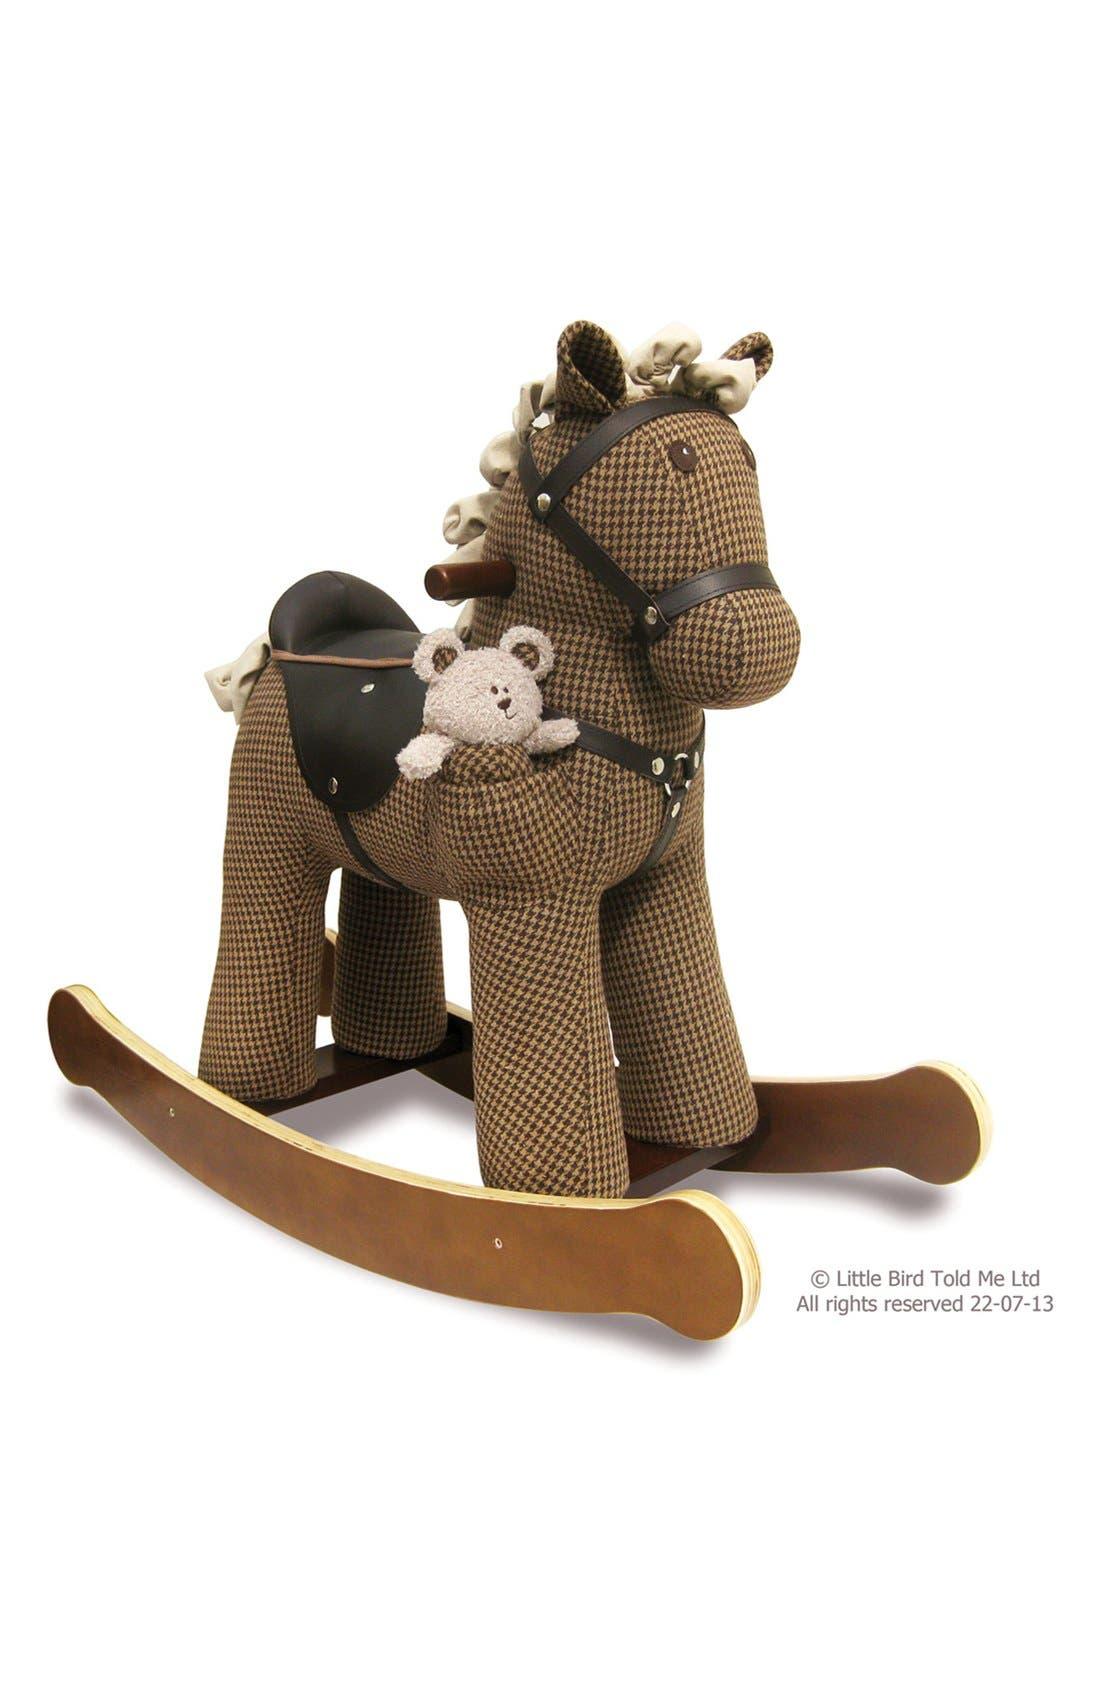 Rocking Horse & Stuffed Animal,                             Main thumbnail 1, color,                             001